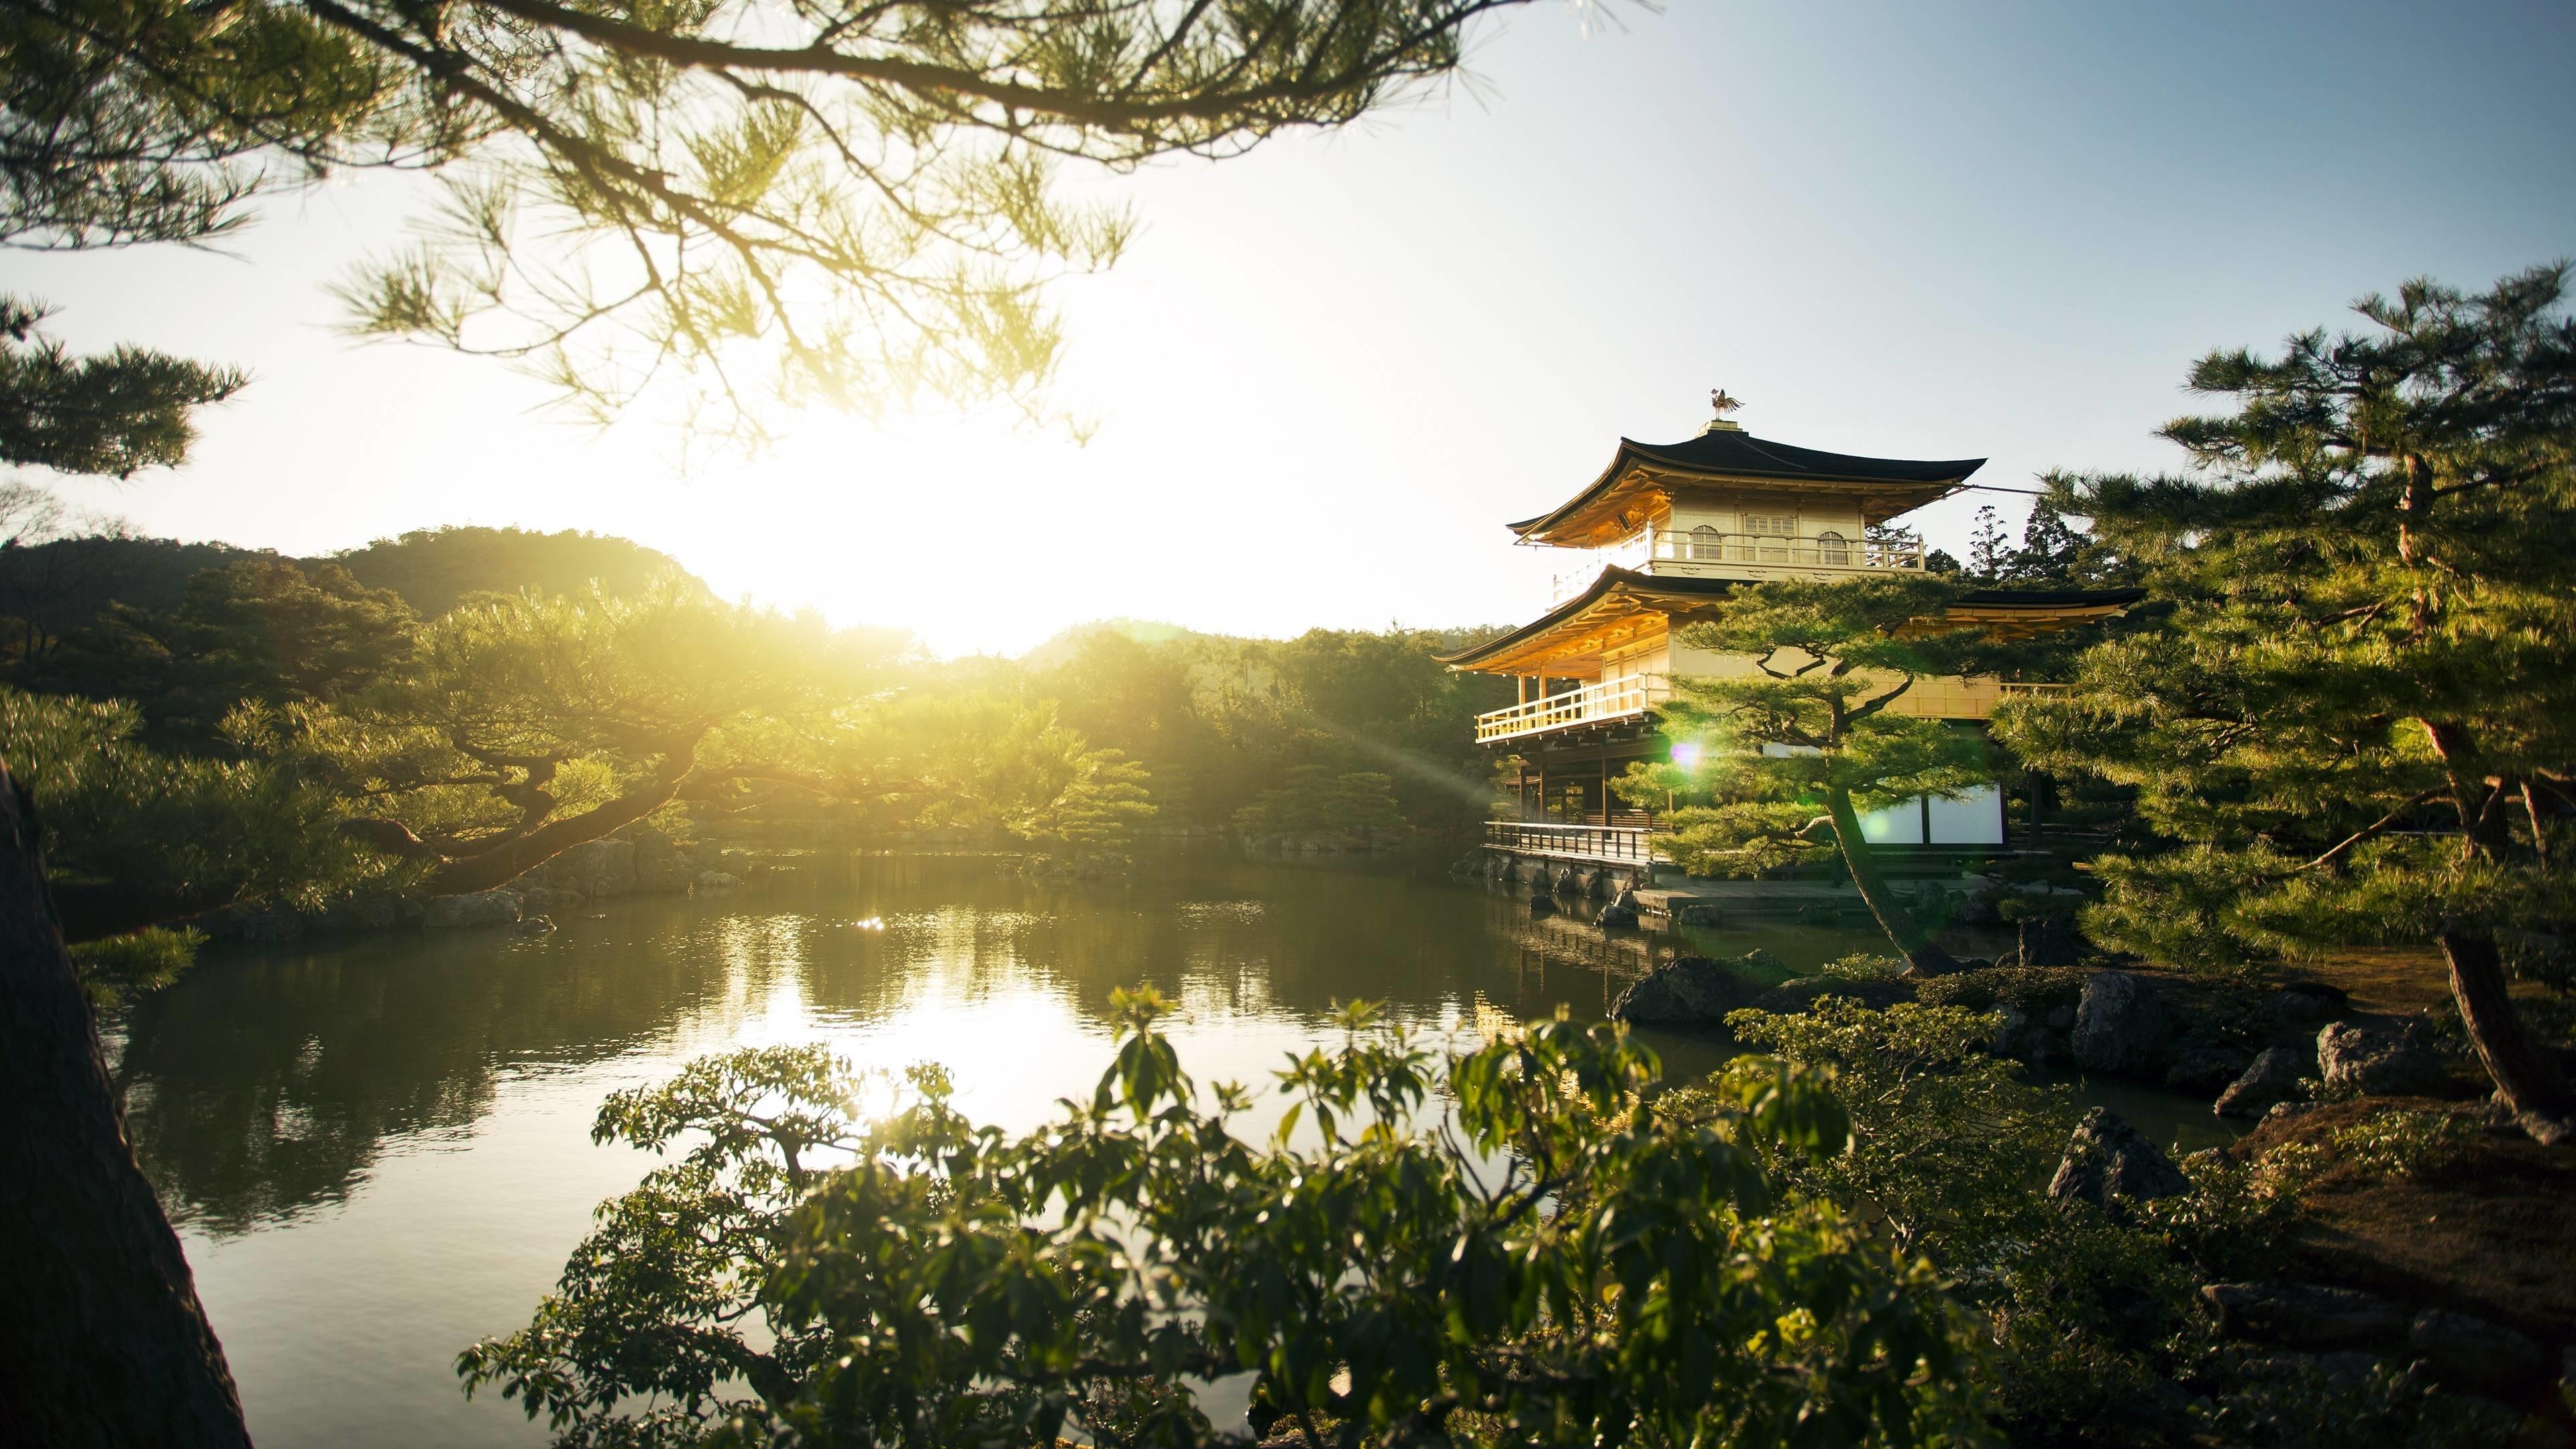 Japanese Wallpapers, HQ RES Wallpapers of Japanese, Desktop-Screens Pack II